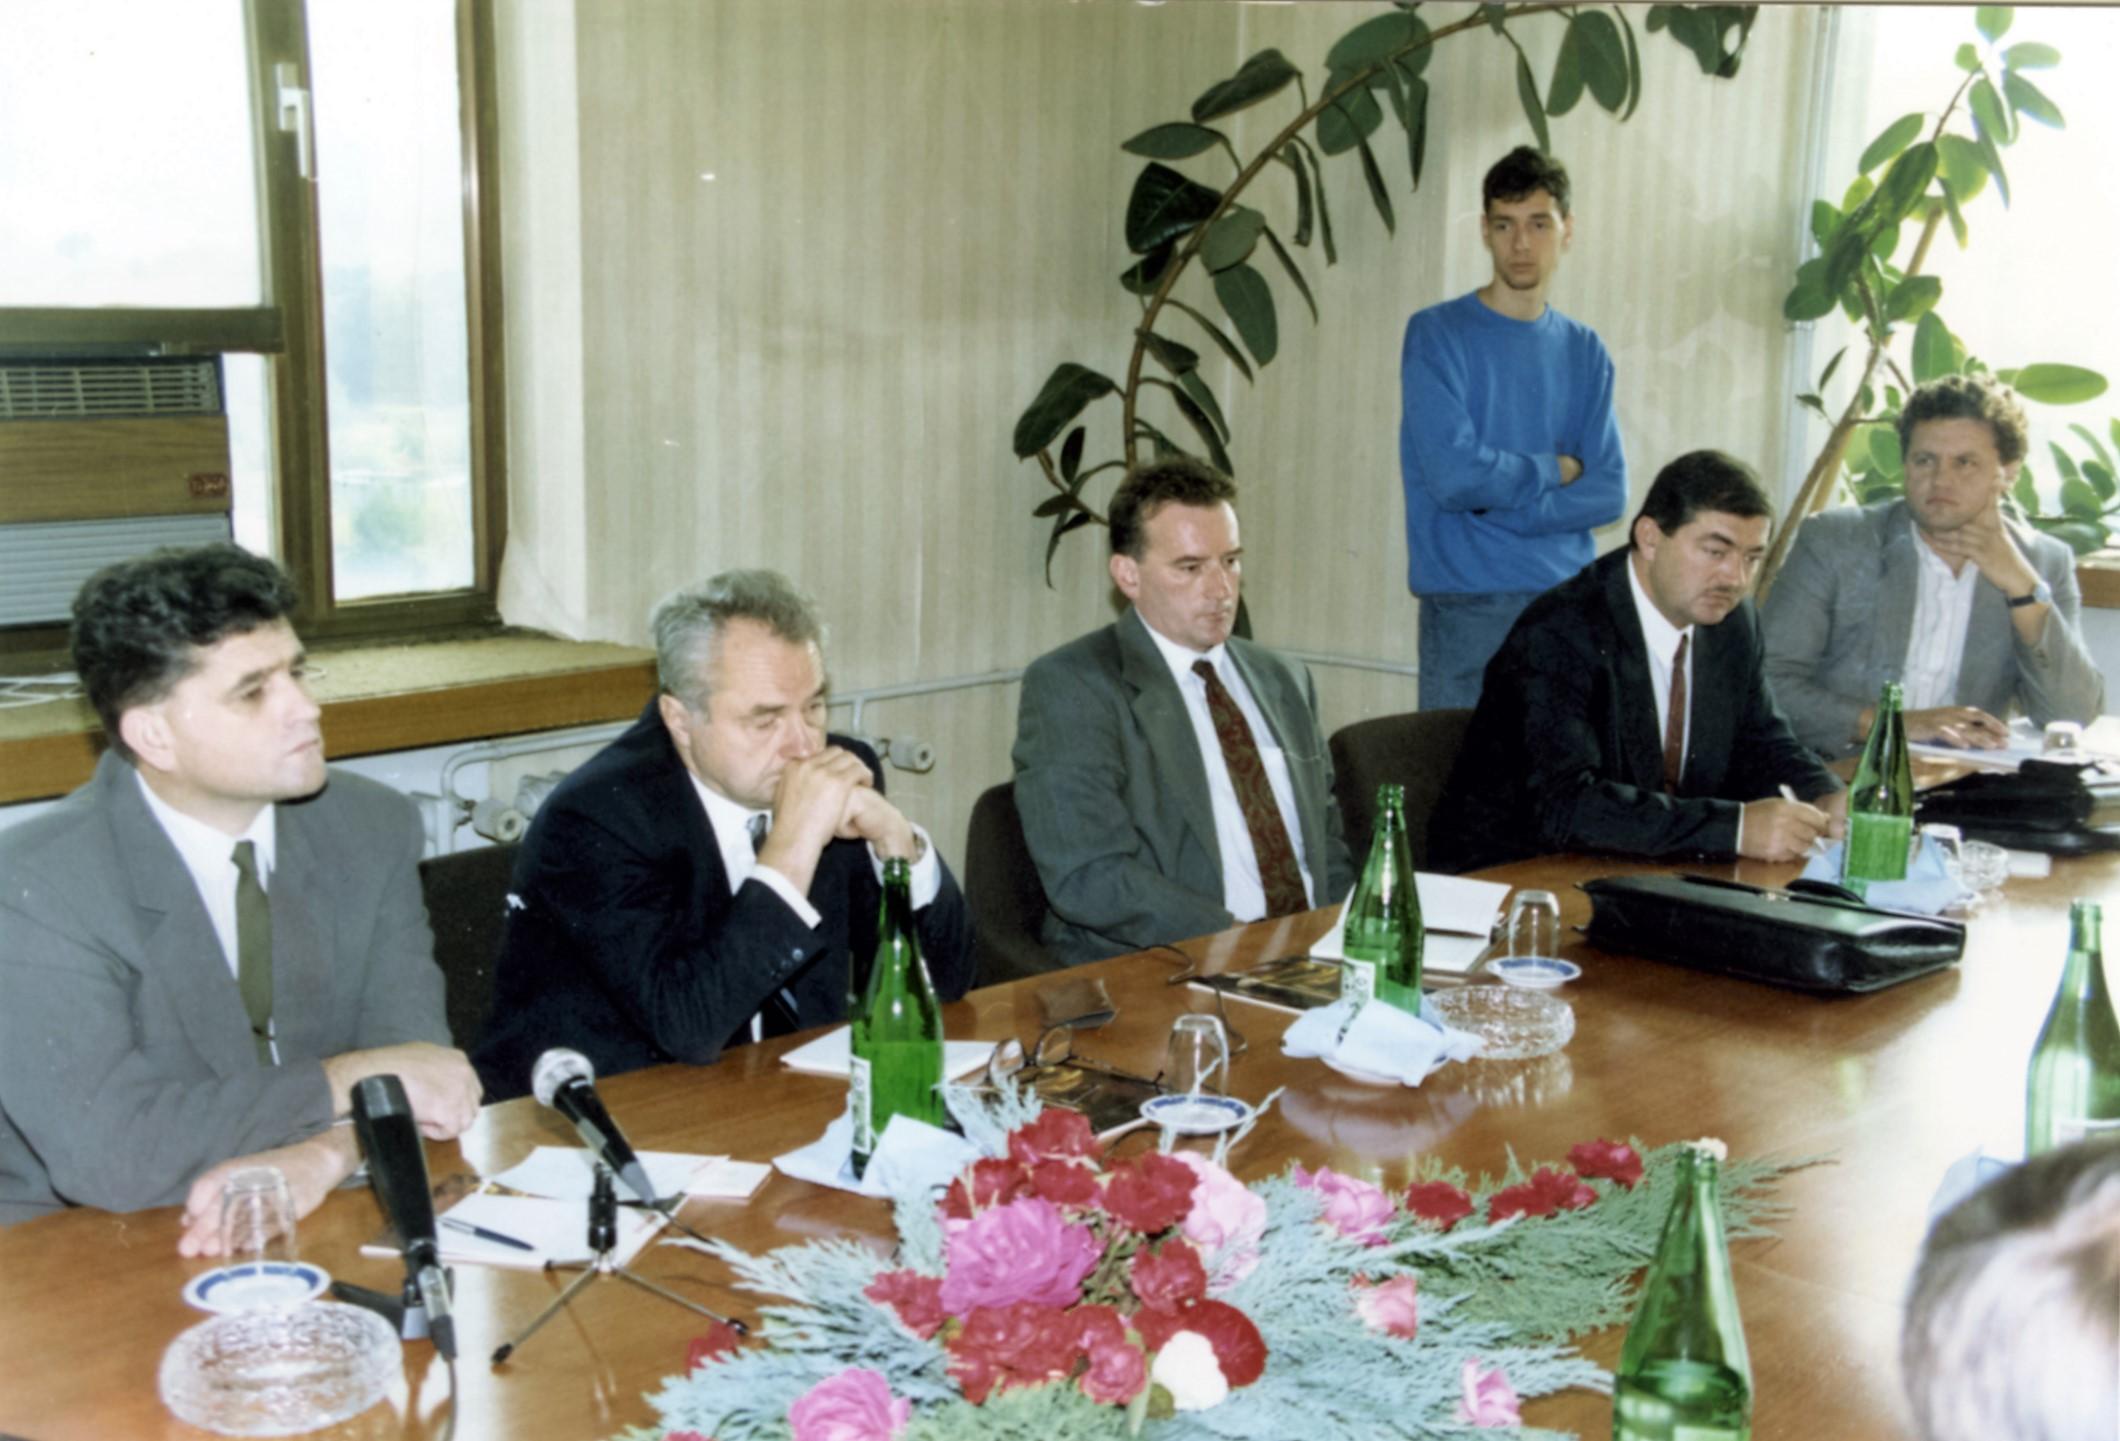 slobo-vermezovivc-4